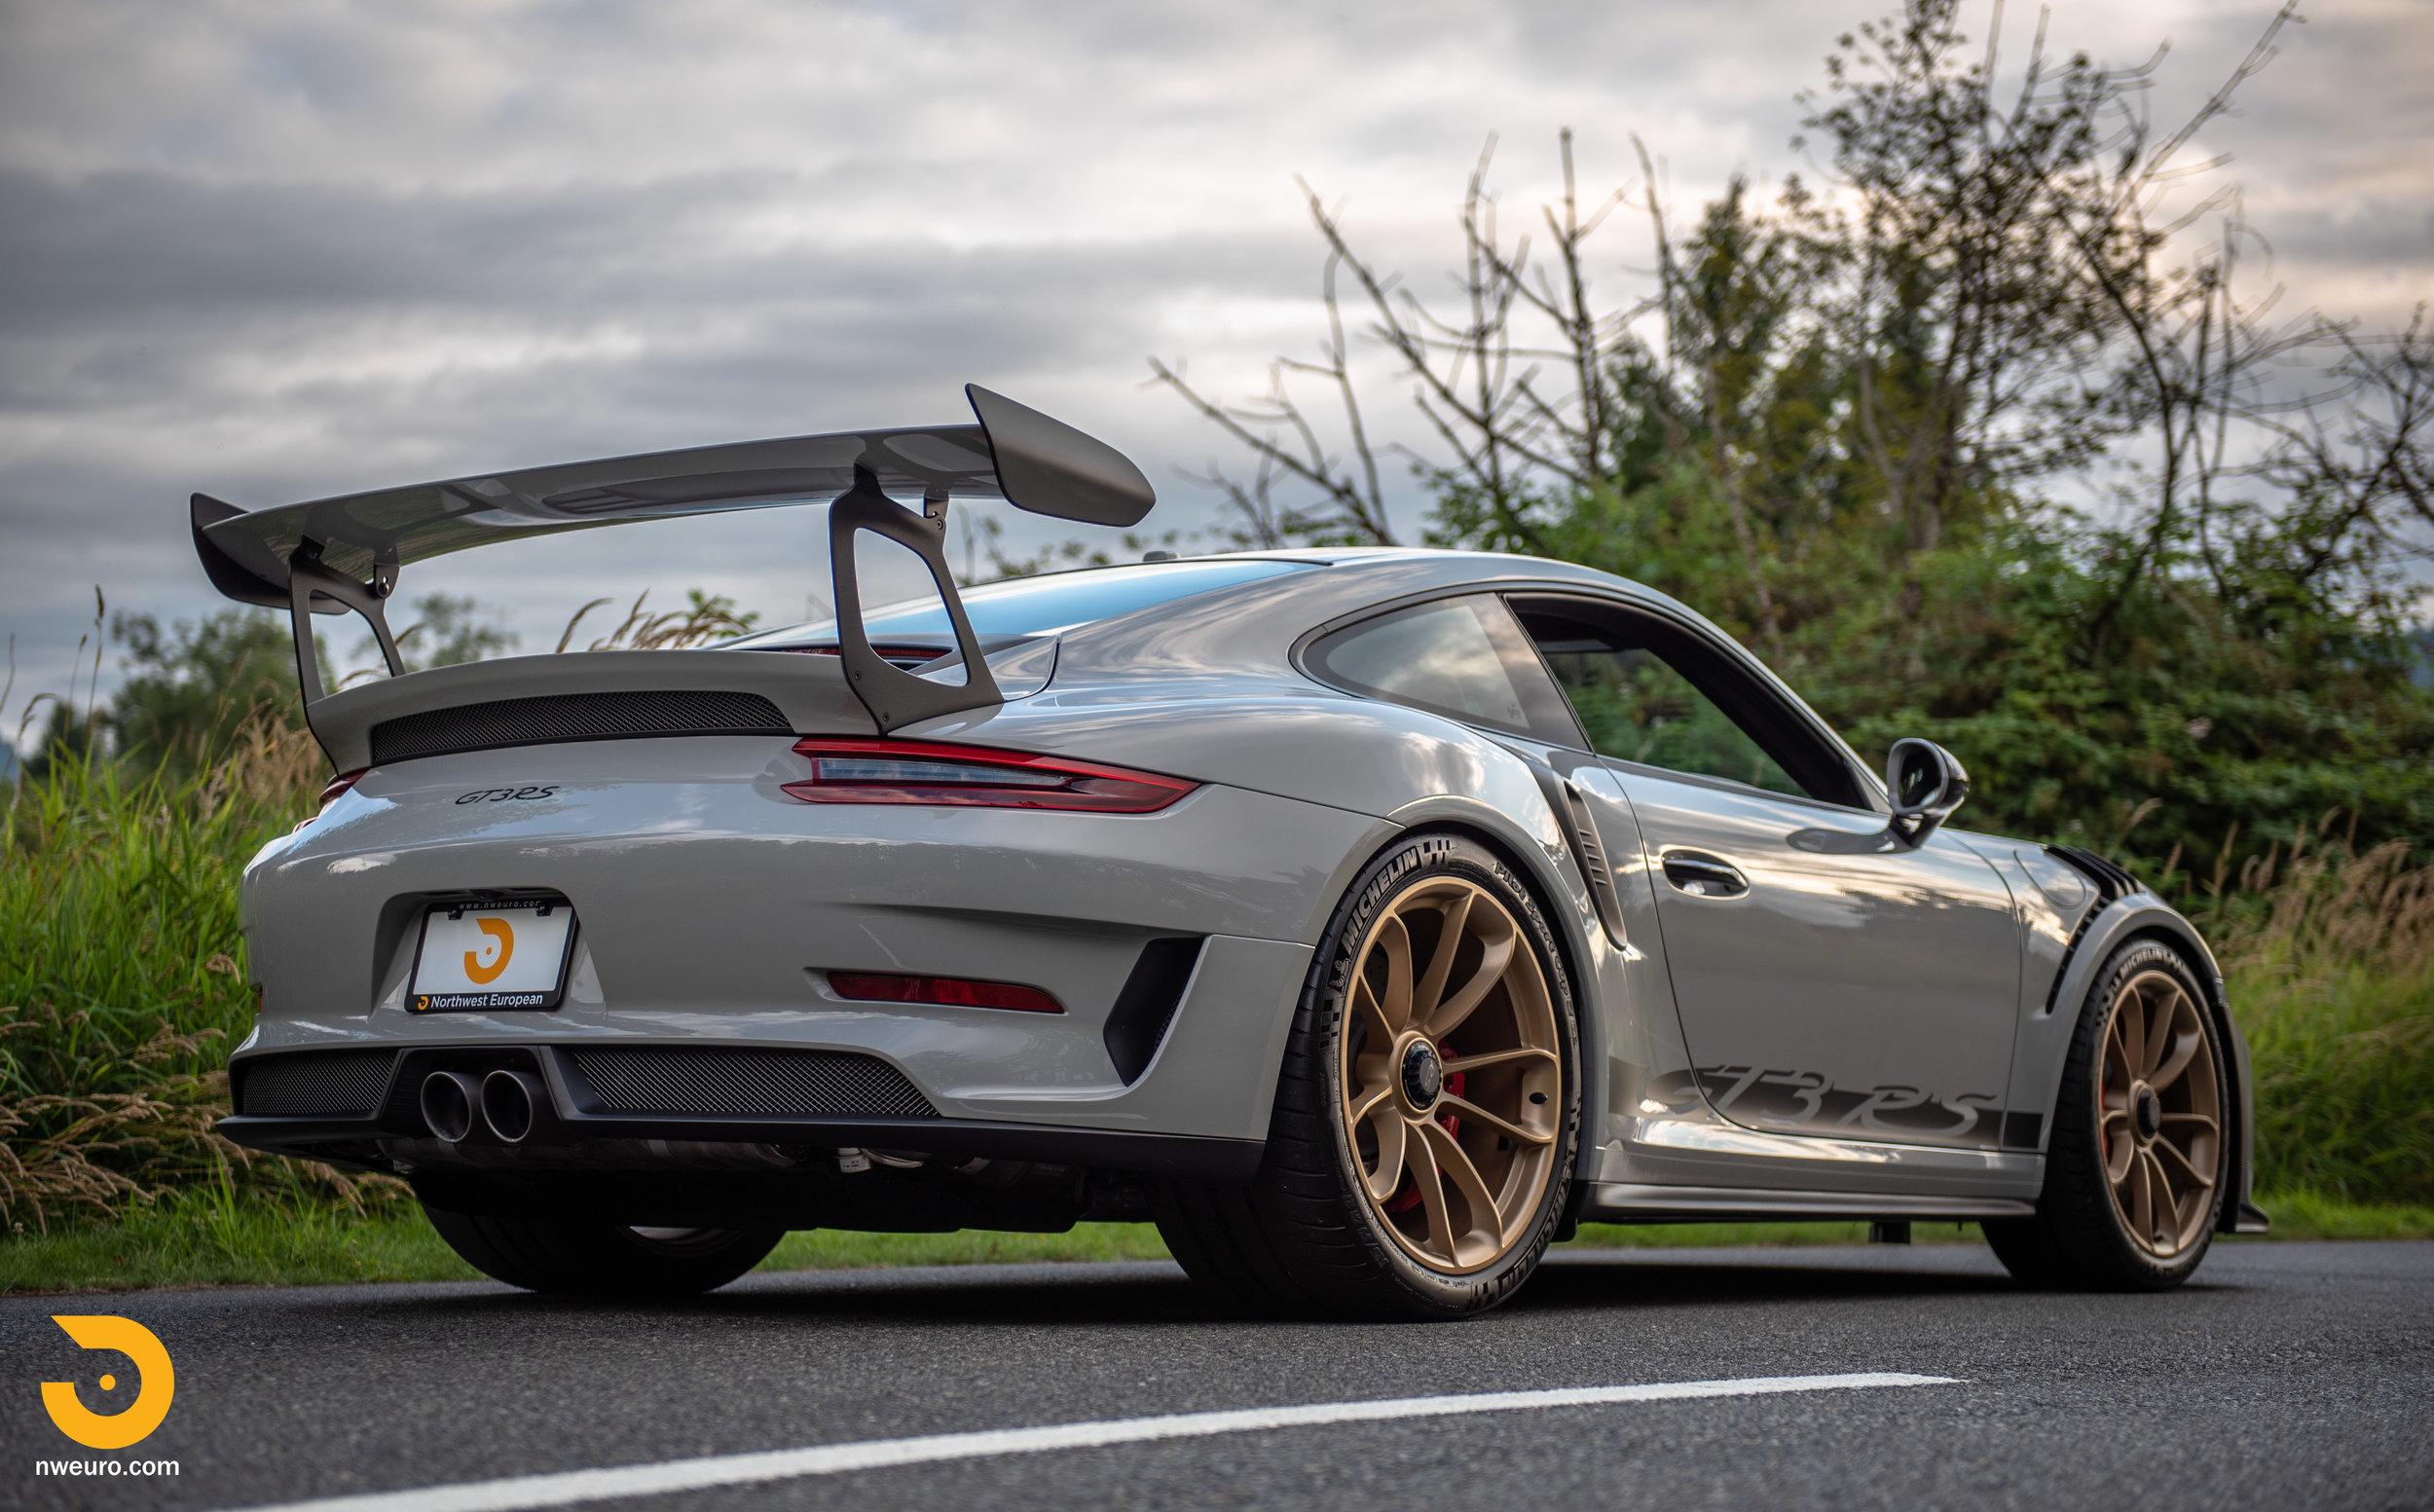 2019 Porsche GT3 RS - Chalk-69.jpg